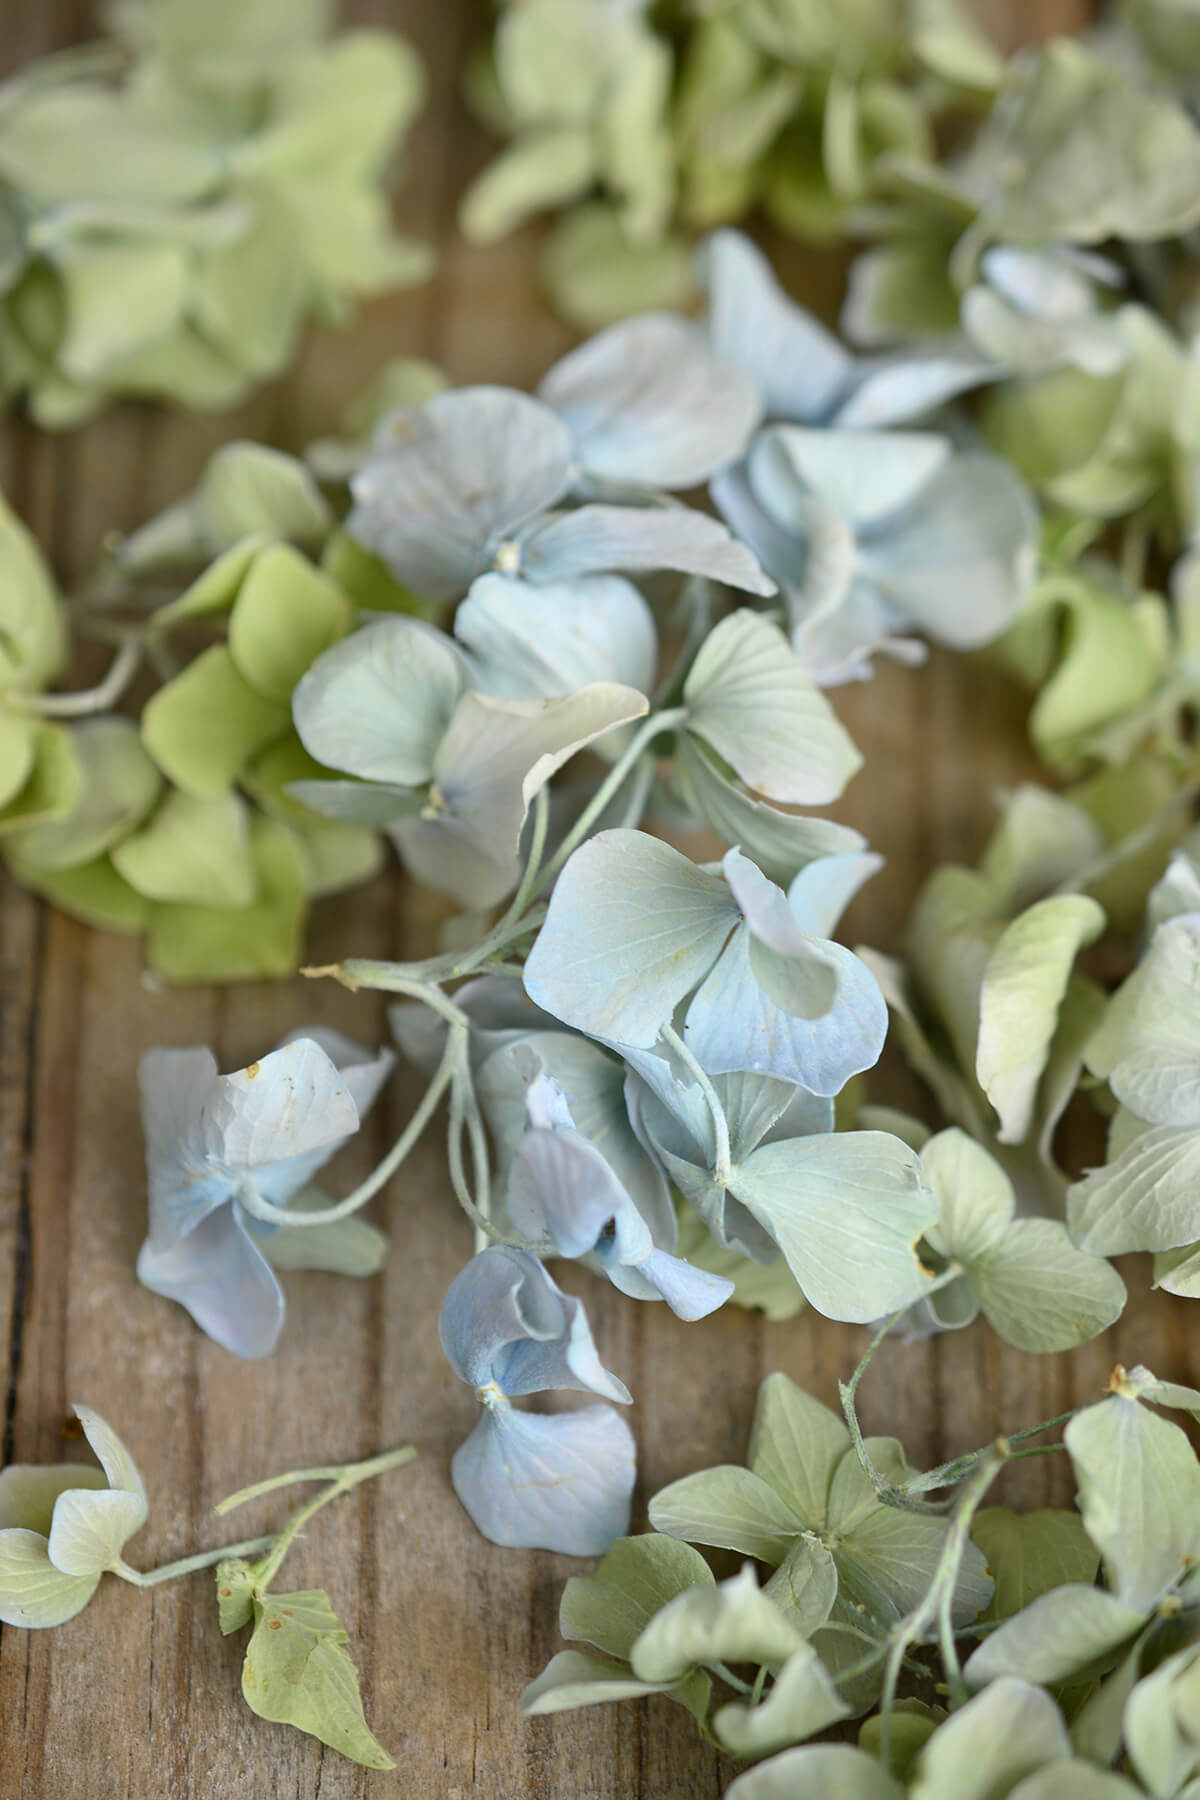 Eco Friendly Preserved Green & Blue Hydrangea Petals- 5 cups